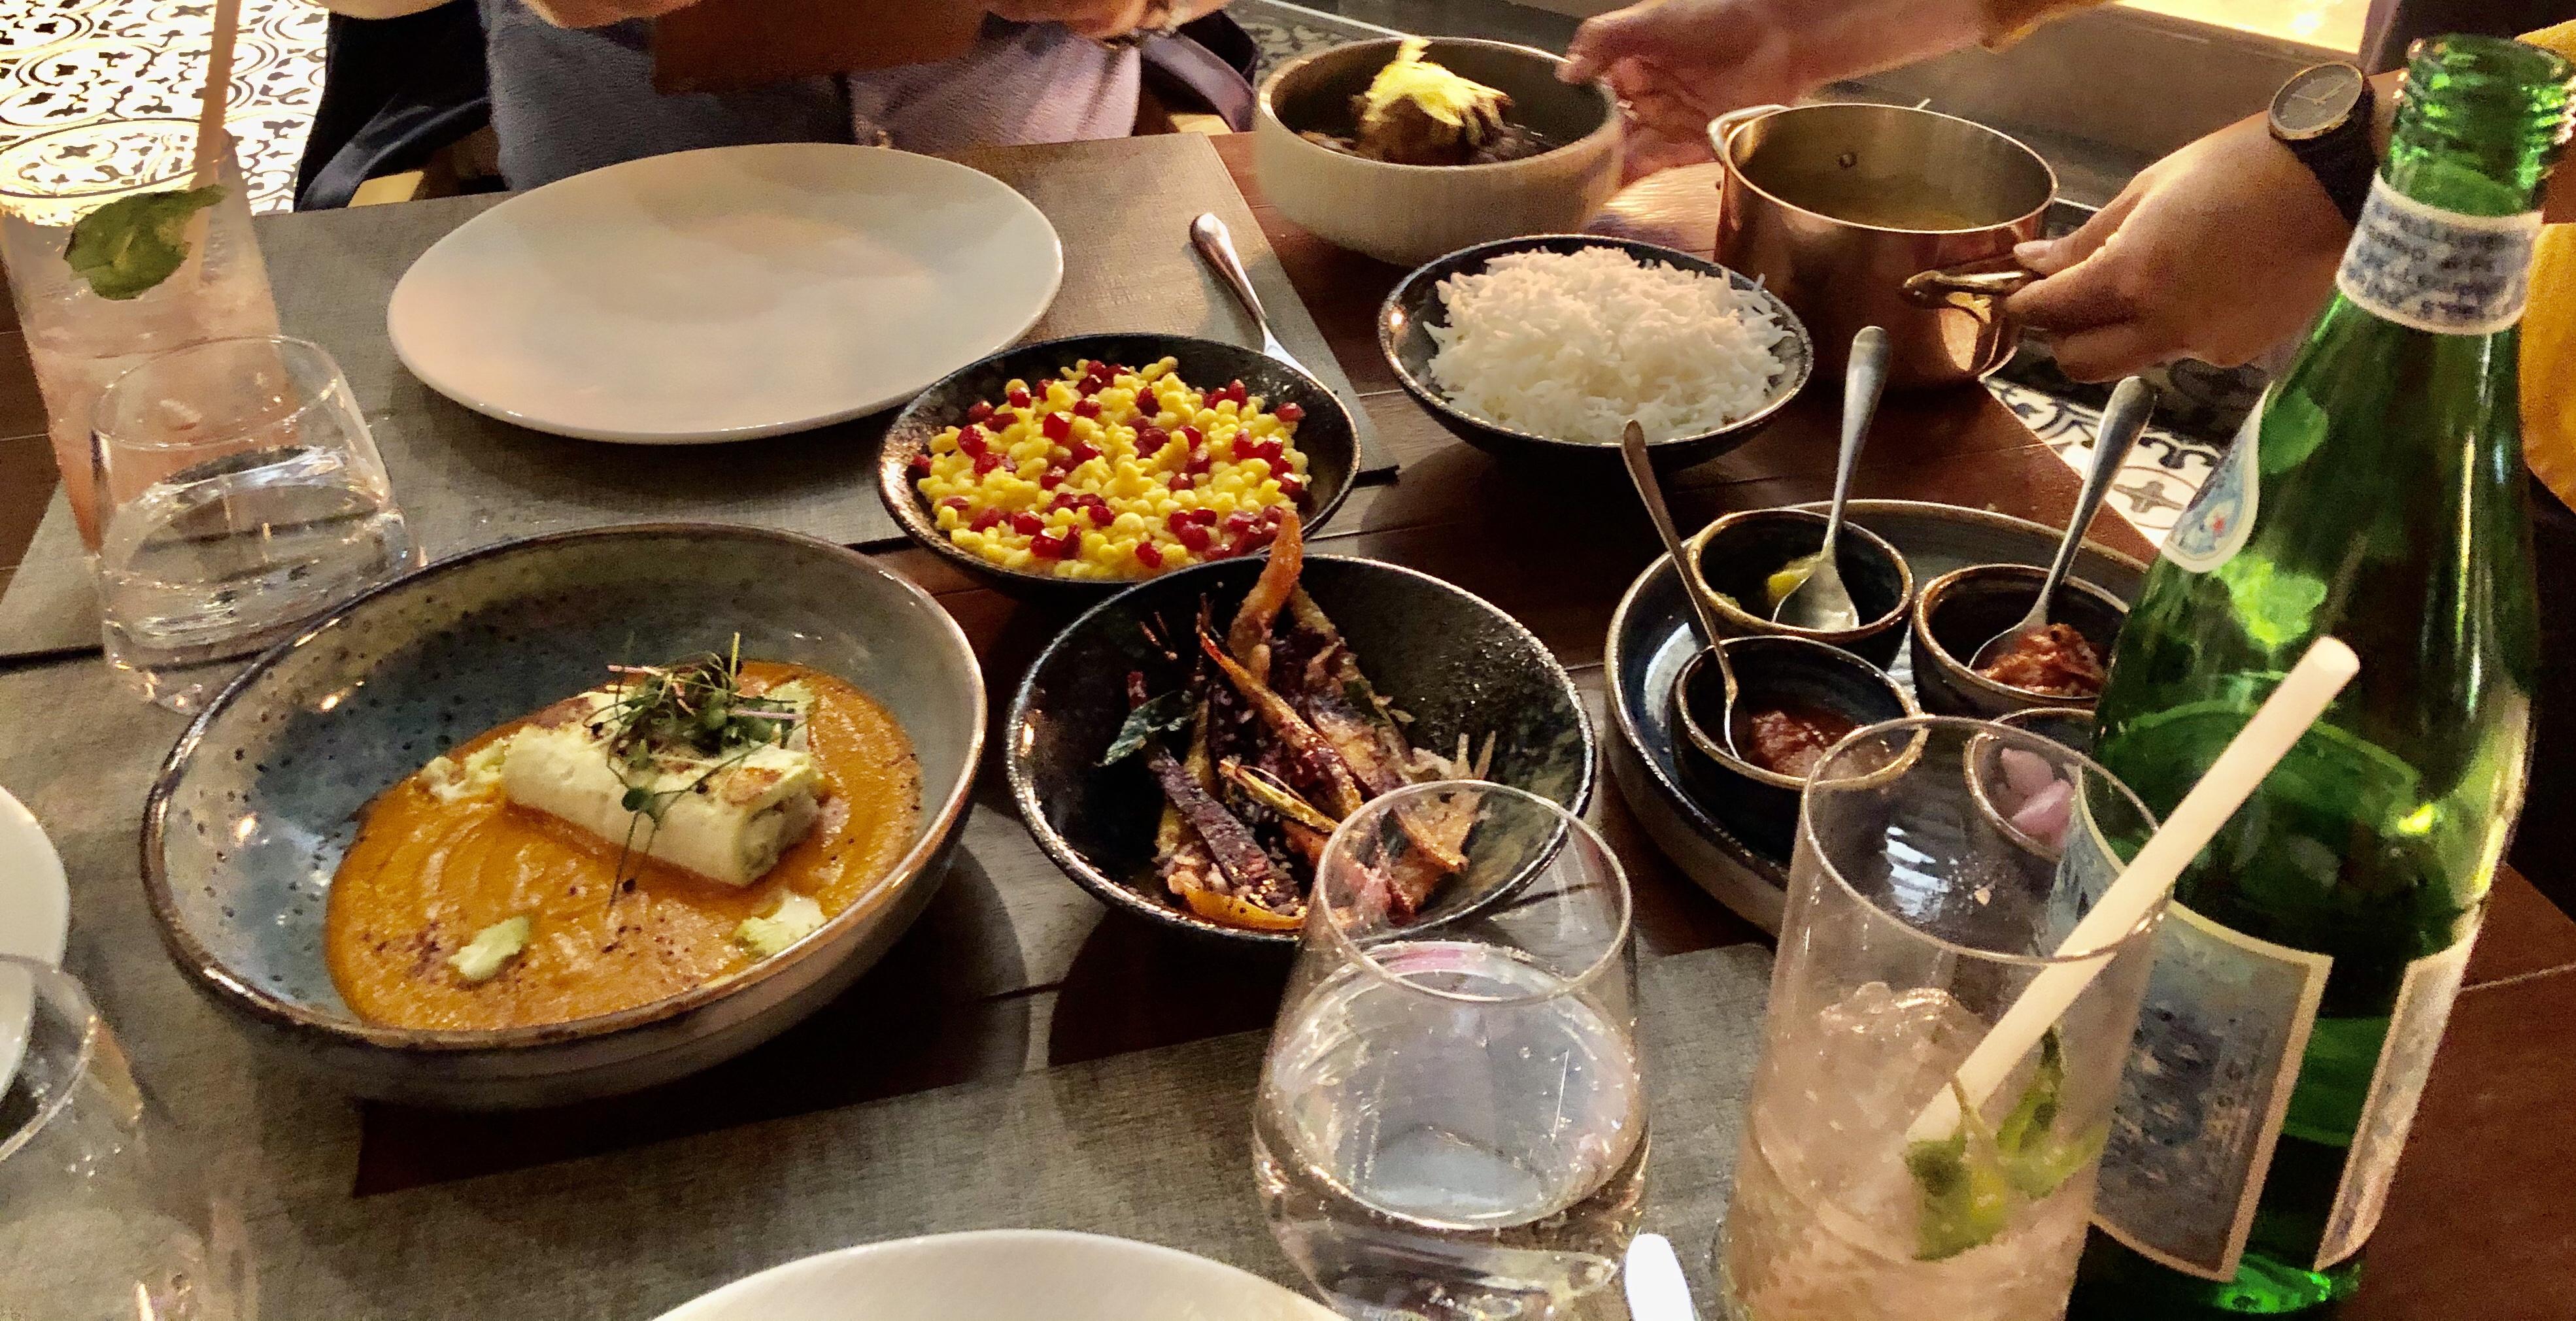 Kinara Restaurant by MasterChef Vikas Khanna – Vandanarajbhatt